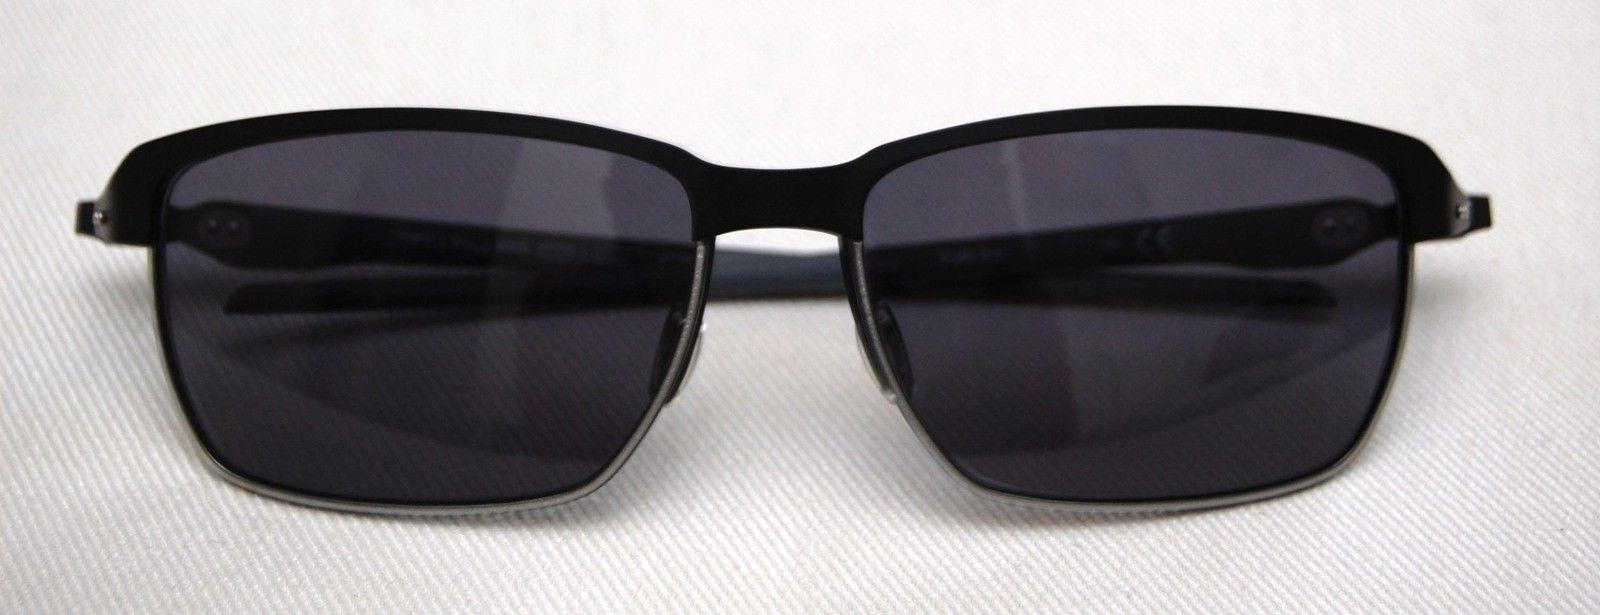 Tinfoil Carbon OO6018-01 Matte Black / Silver   Grey Lens - 05.jpg